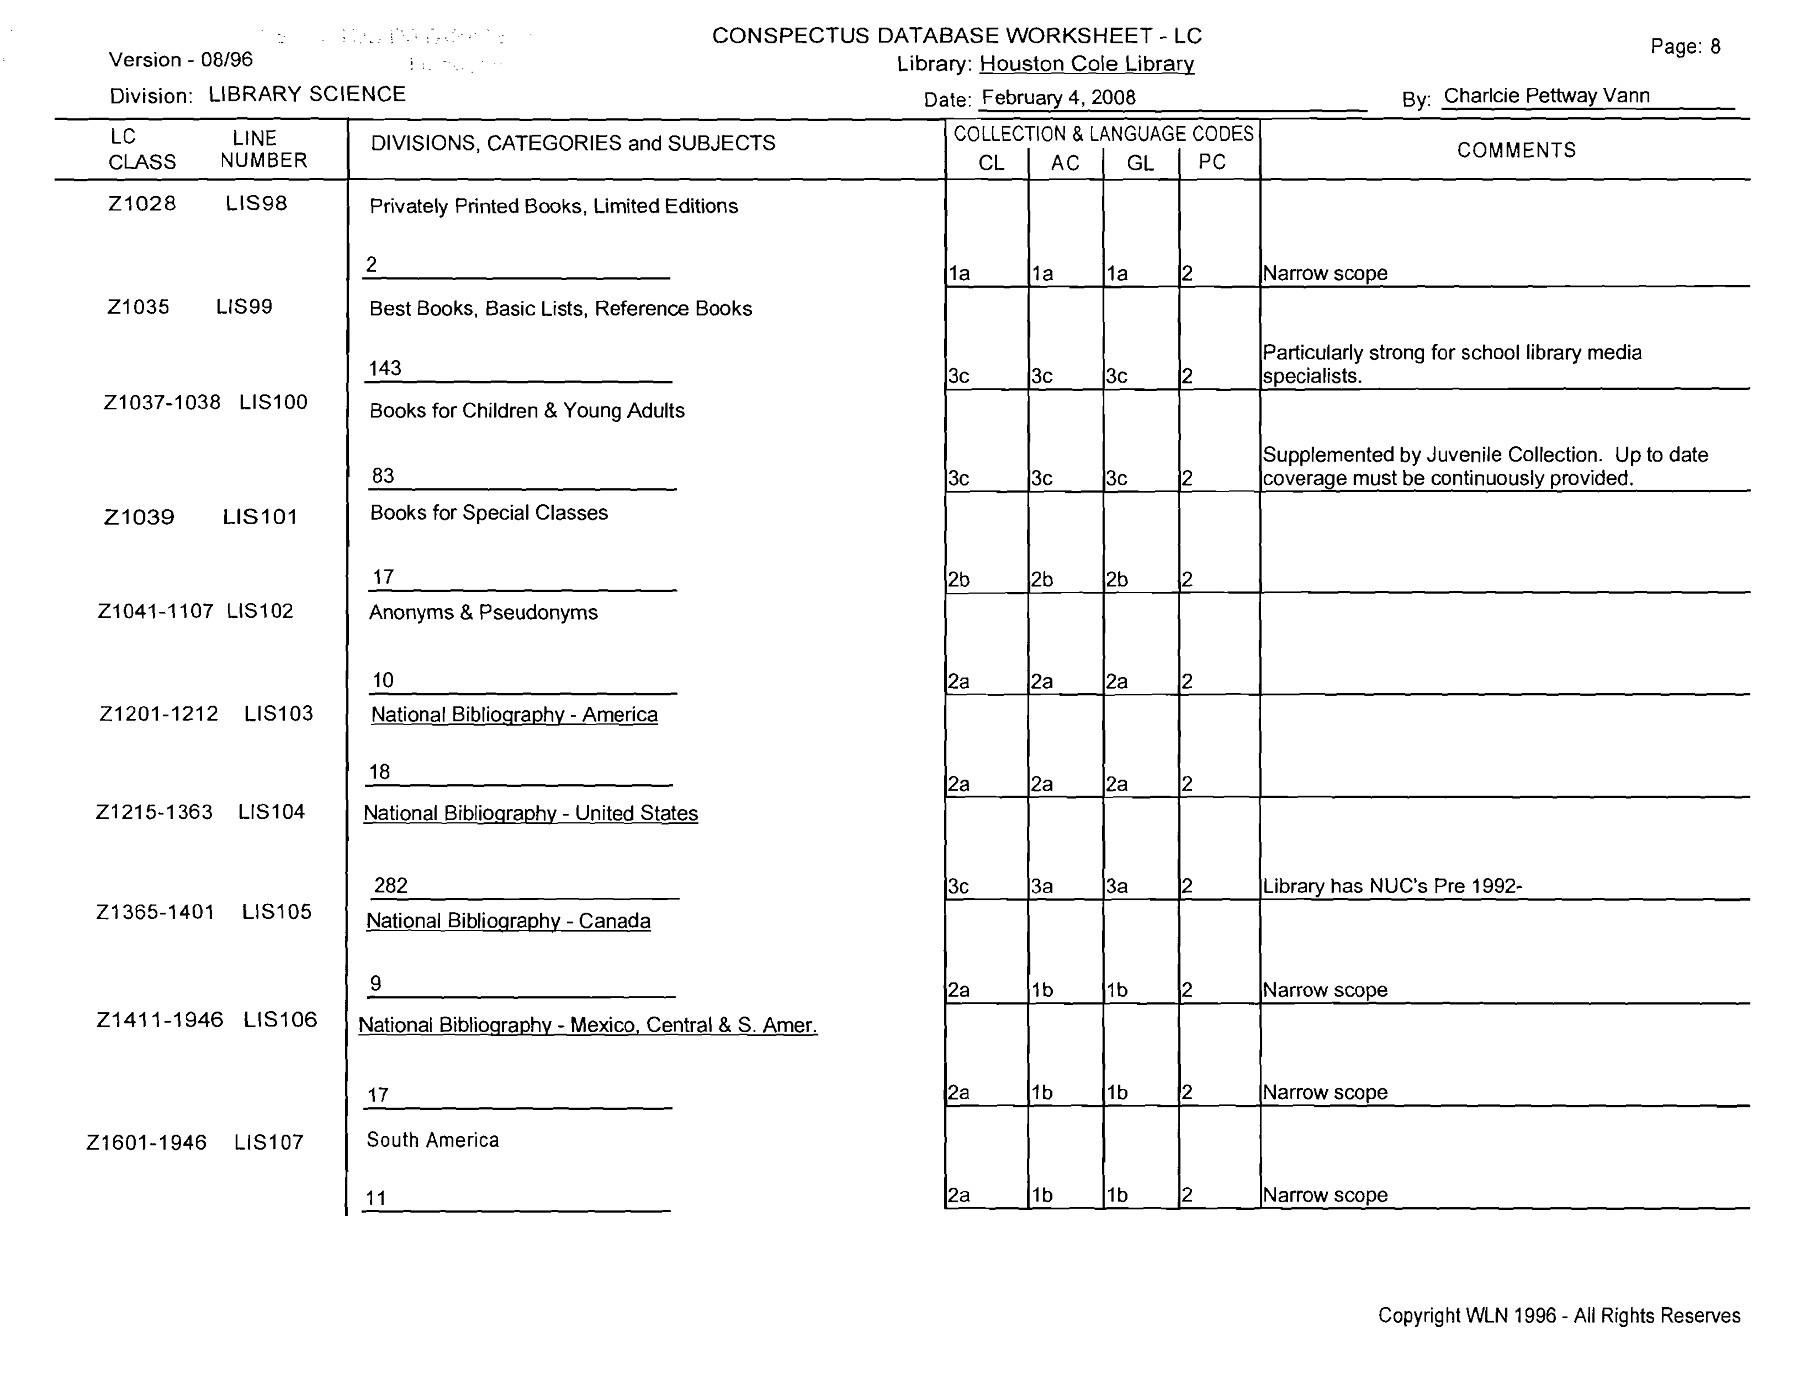 Library Database Worksheet